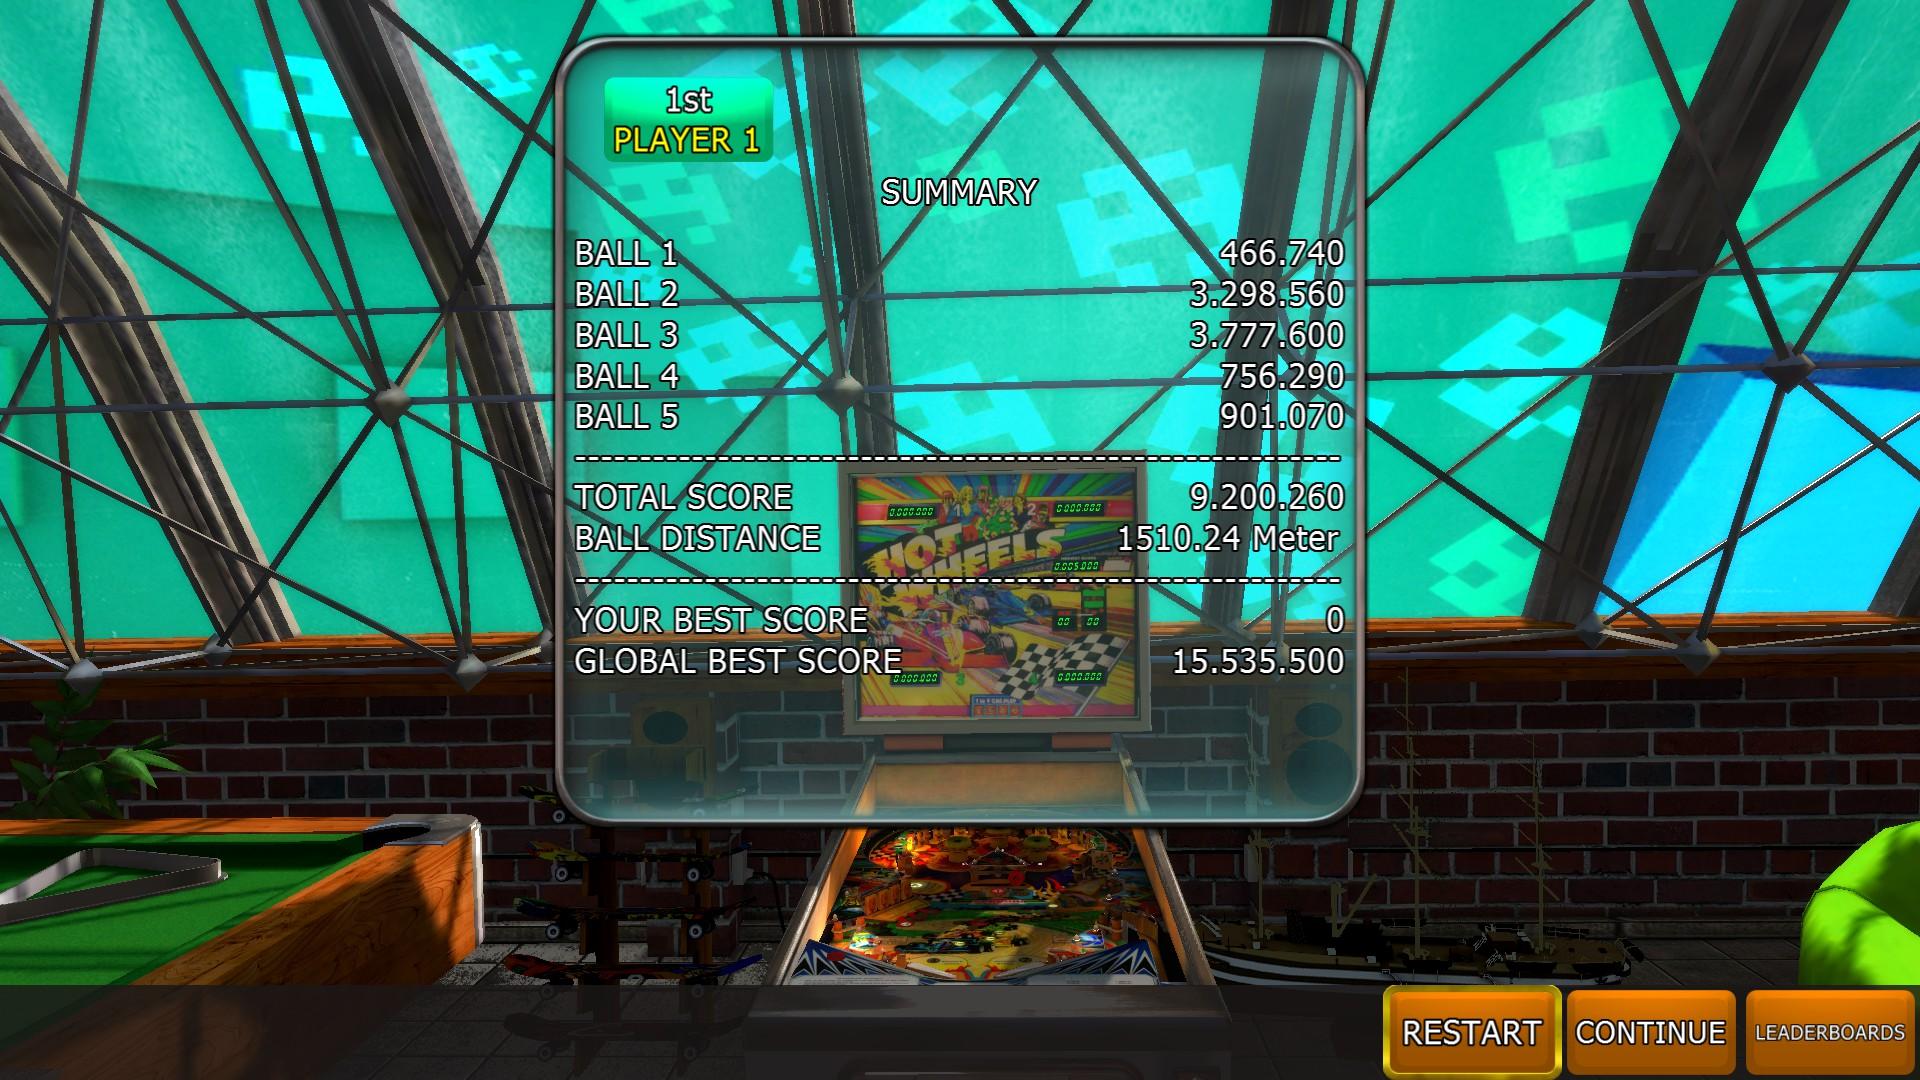 Zaccaria Pinball: Hot Wheels [5 balls] 9,200,260 points